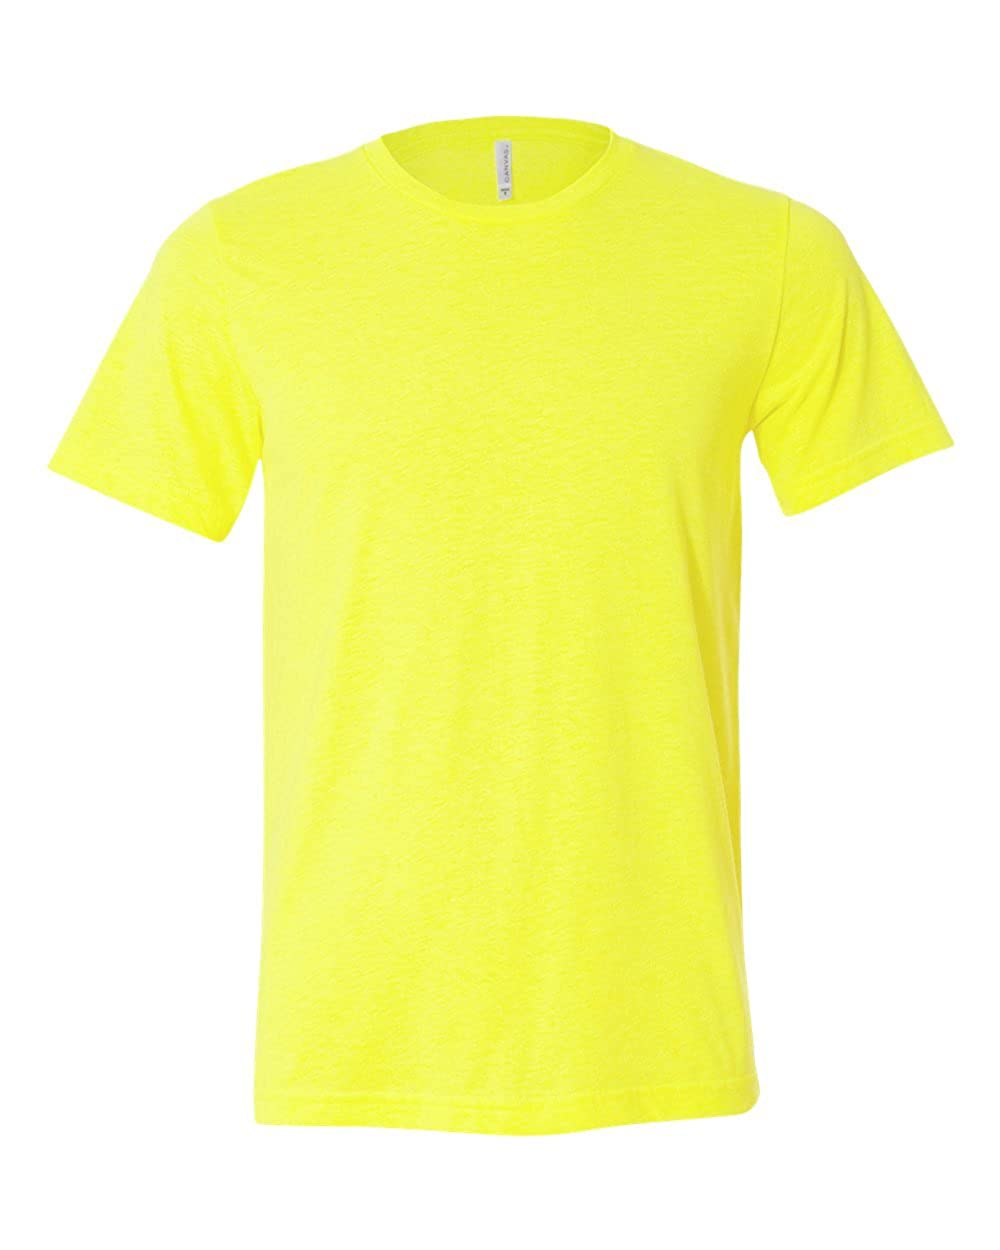 Neon Yellow Bella+Canvas Classic Ringspun Short Sleeve T-Shirt Large